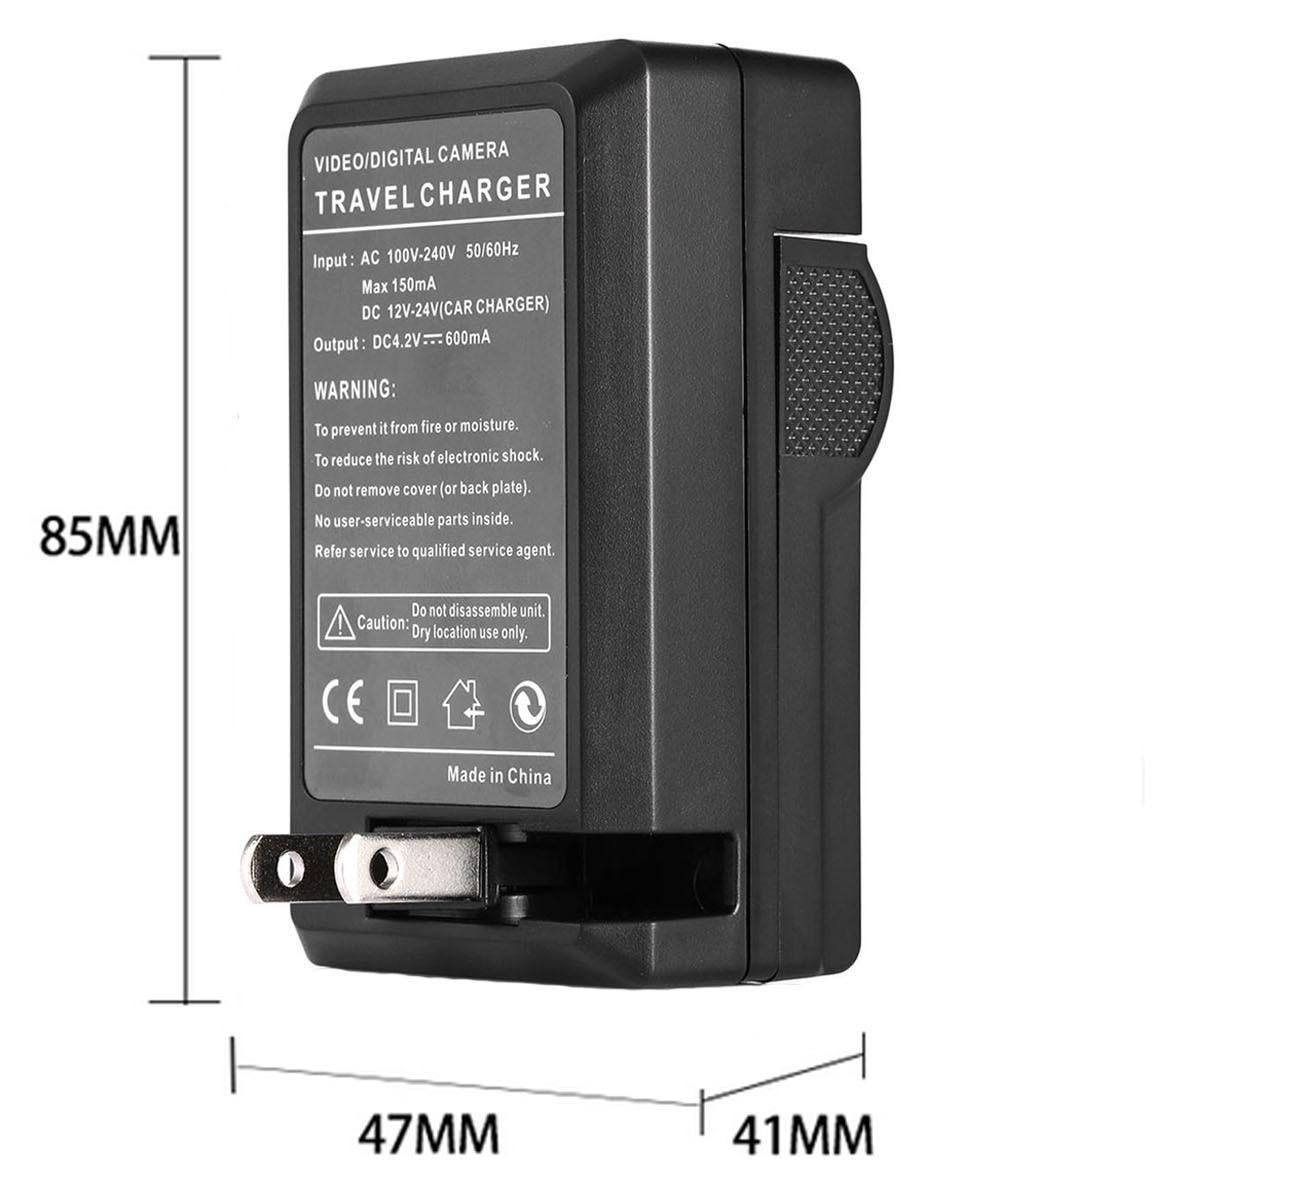 SC-D77 Digital Video Camcorder SC-D71 SC-D73 LCD USB Travel Battery Charger for Samsung SC-D70 SC-D75